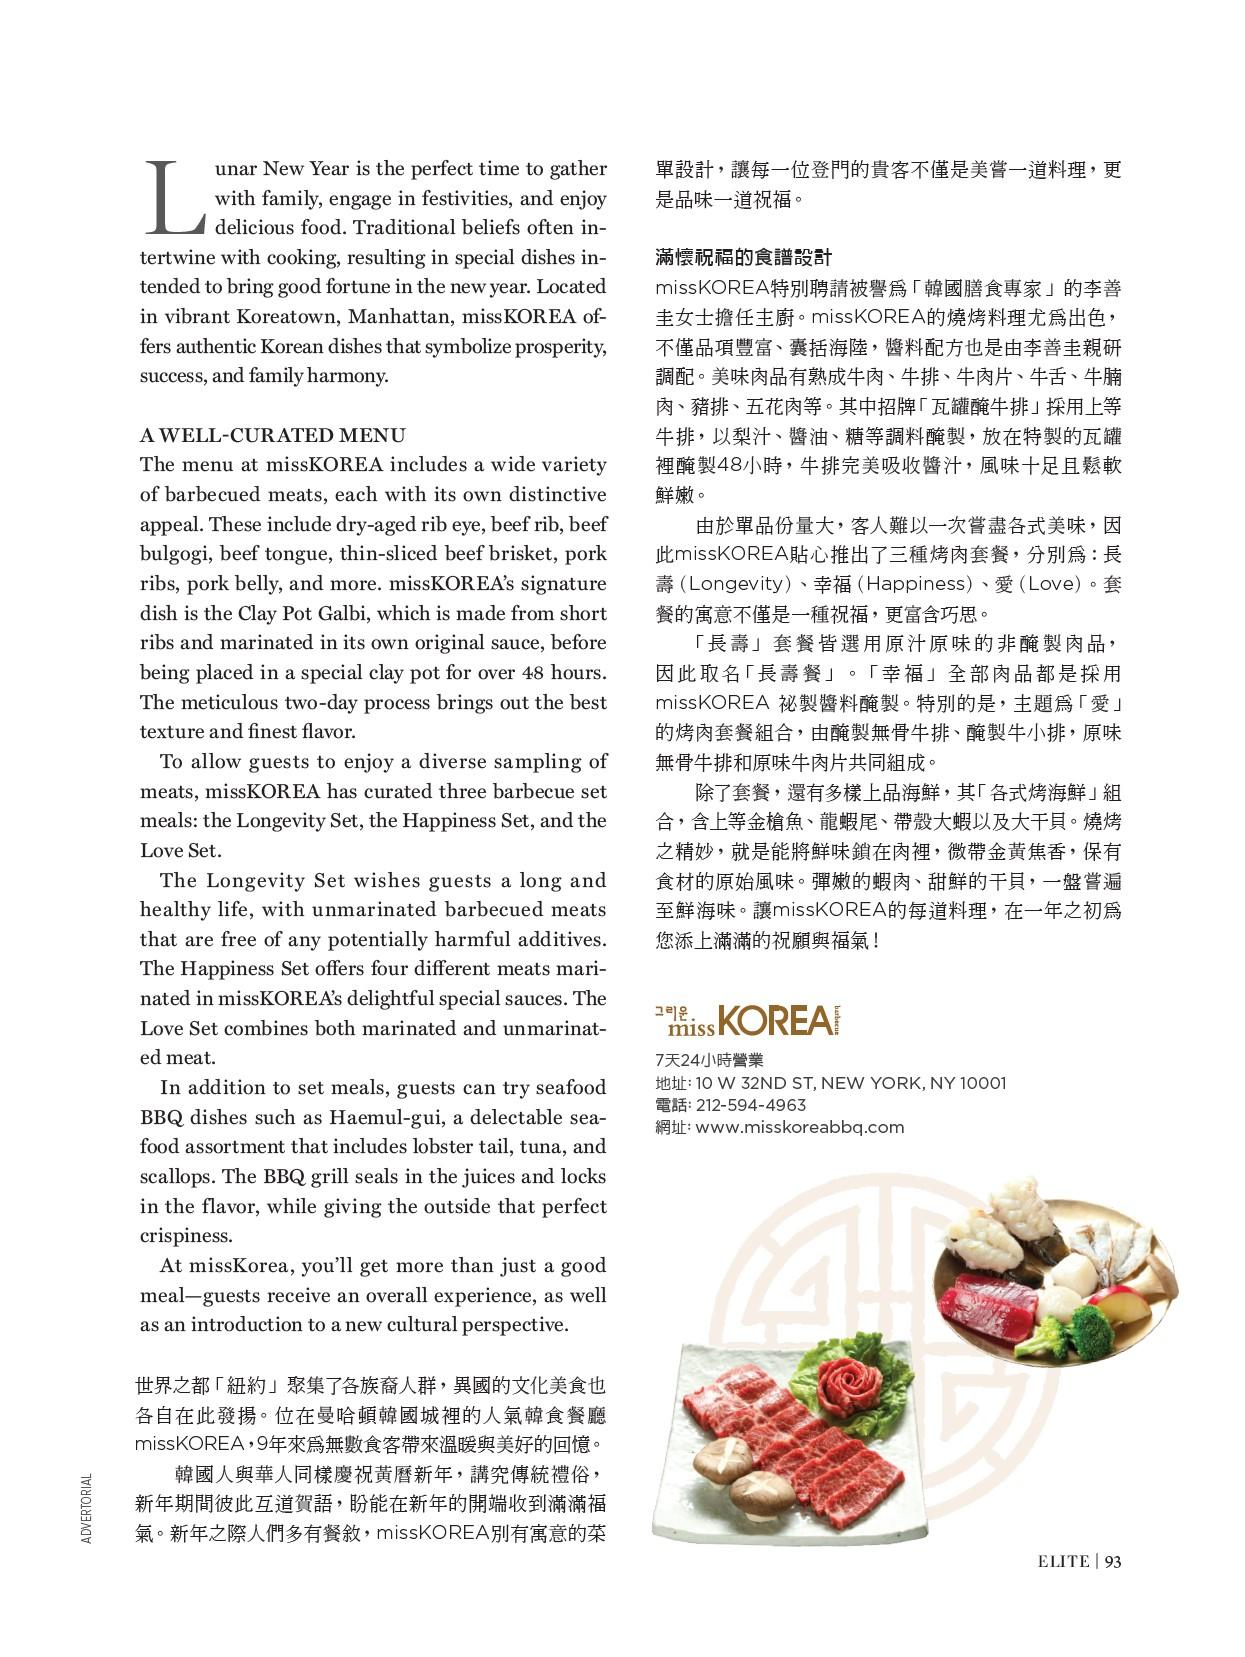 Delicious Seasonal Greetings with Gourmet Korean Food